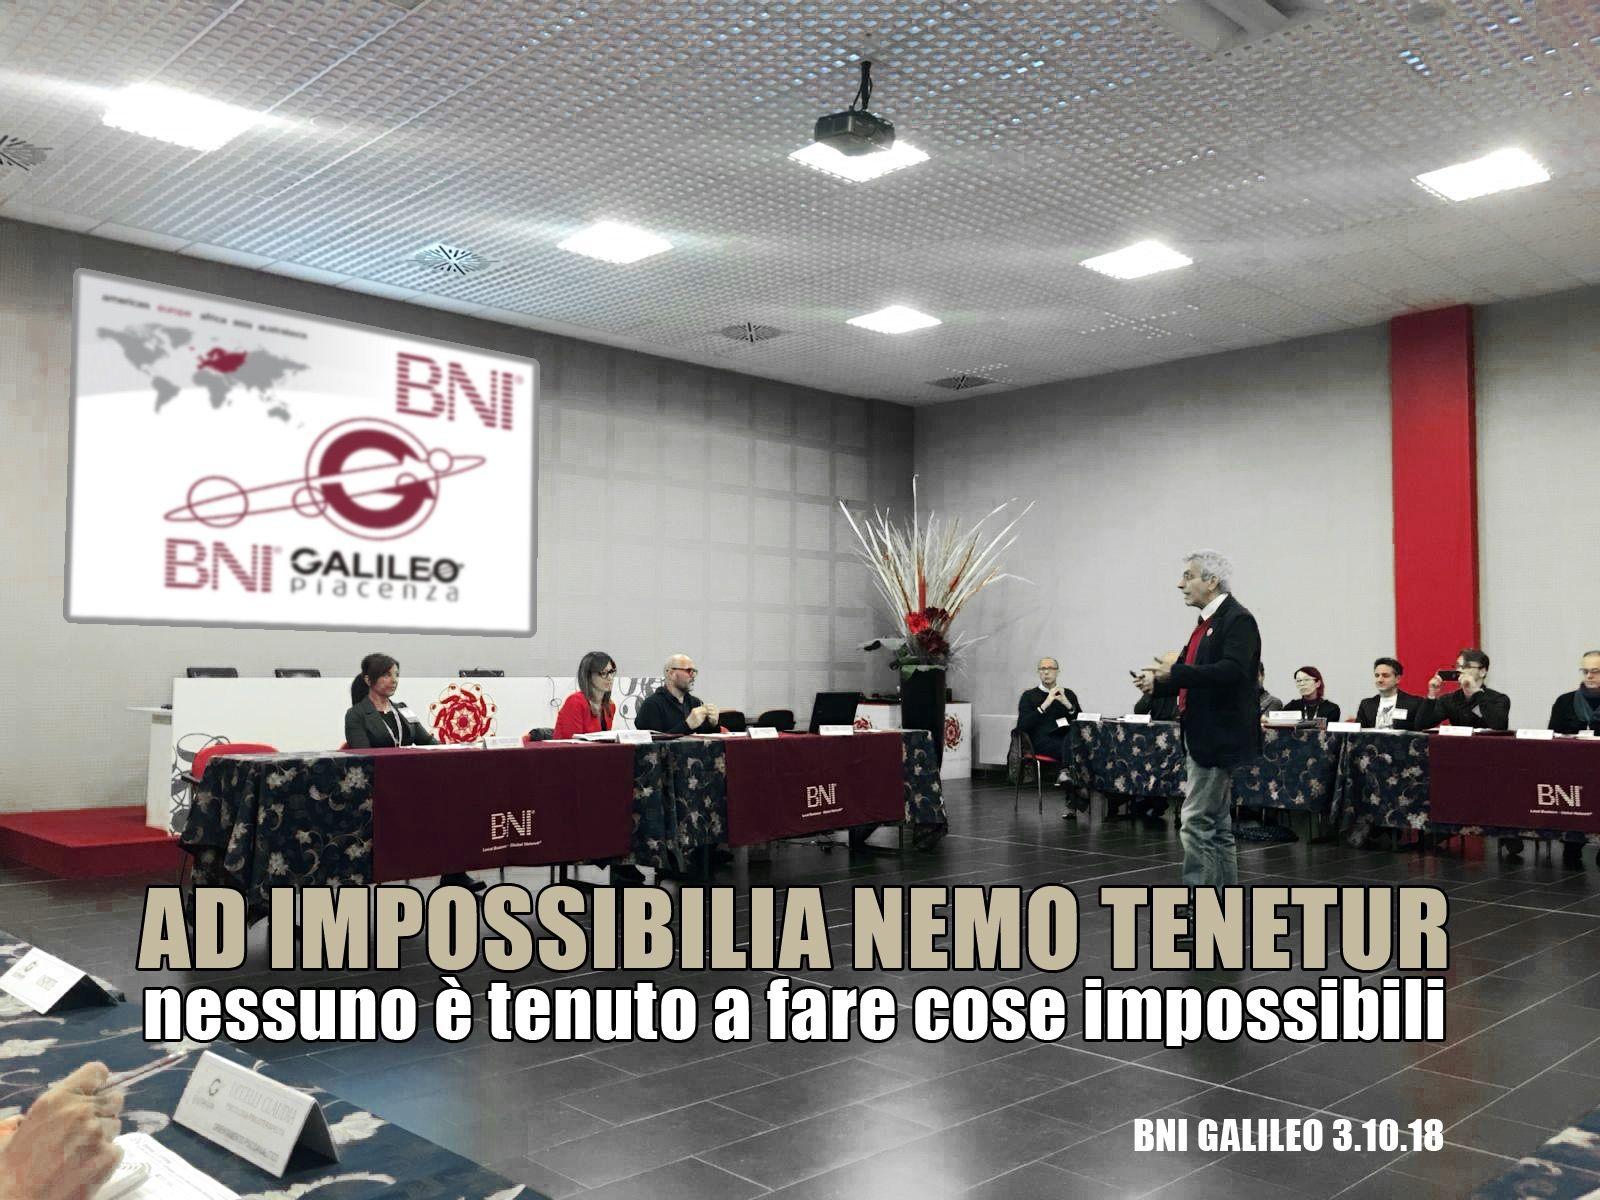 ad impossibilia